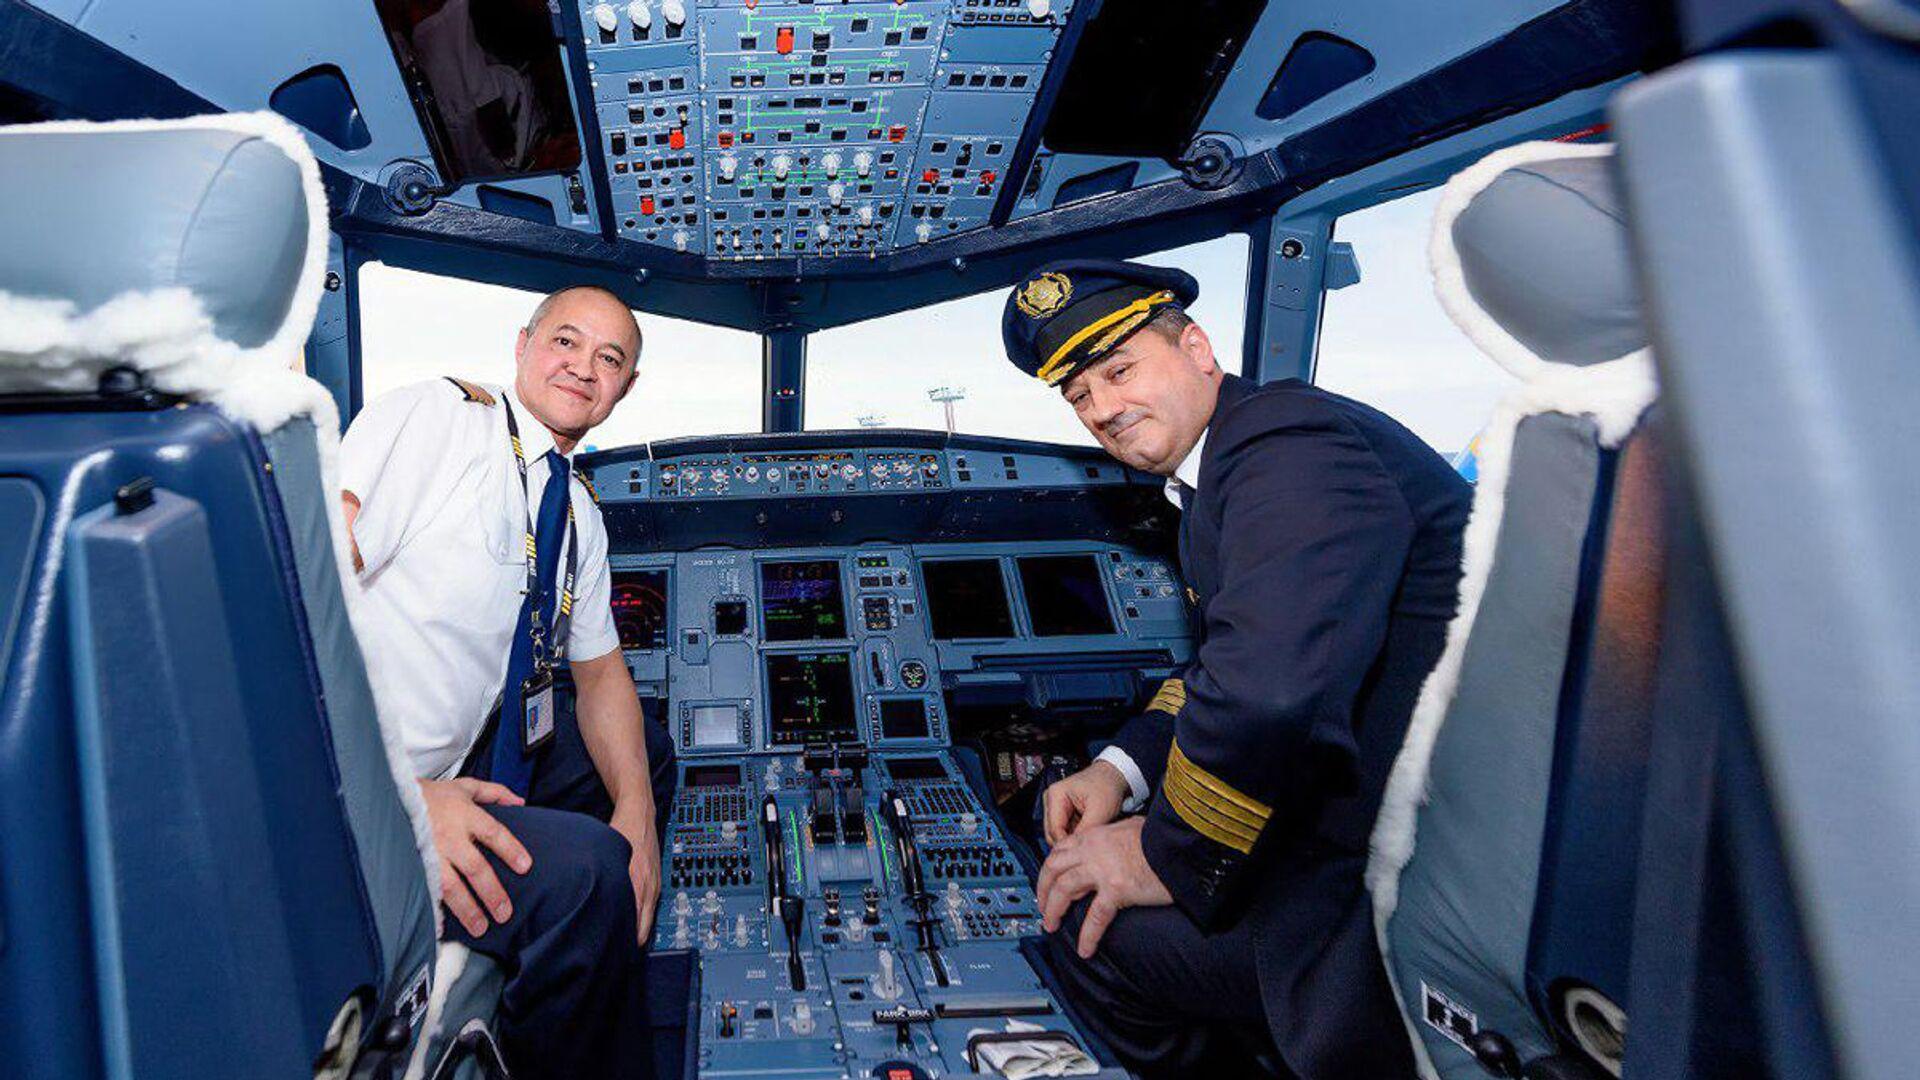 Airbus поставил первый A320neo для Узбекистон хаво йуллари - Sputnik Узбекистан, 1920, 12.09.2021